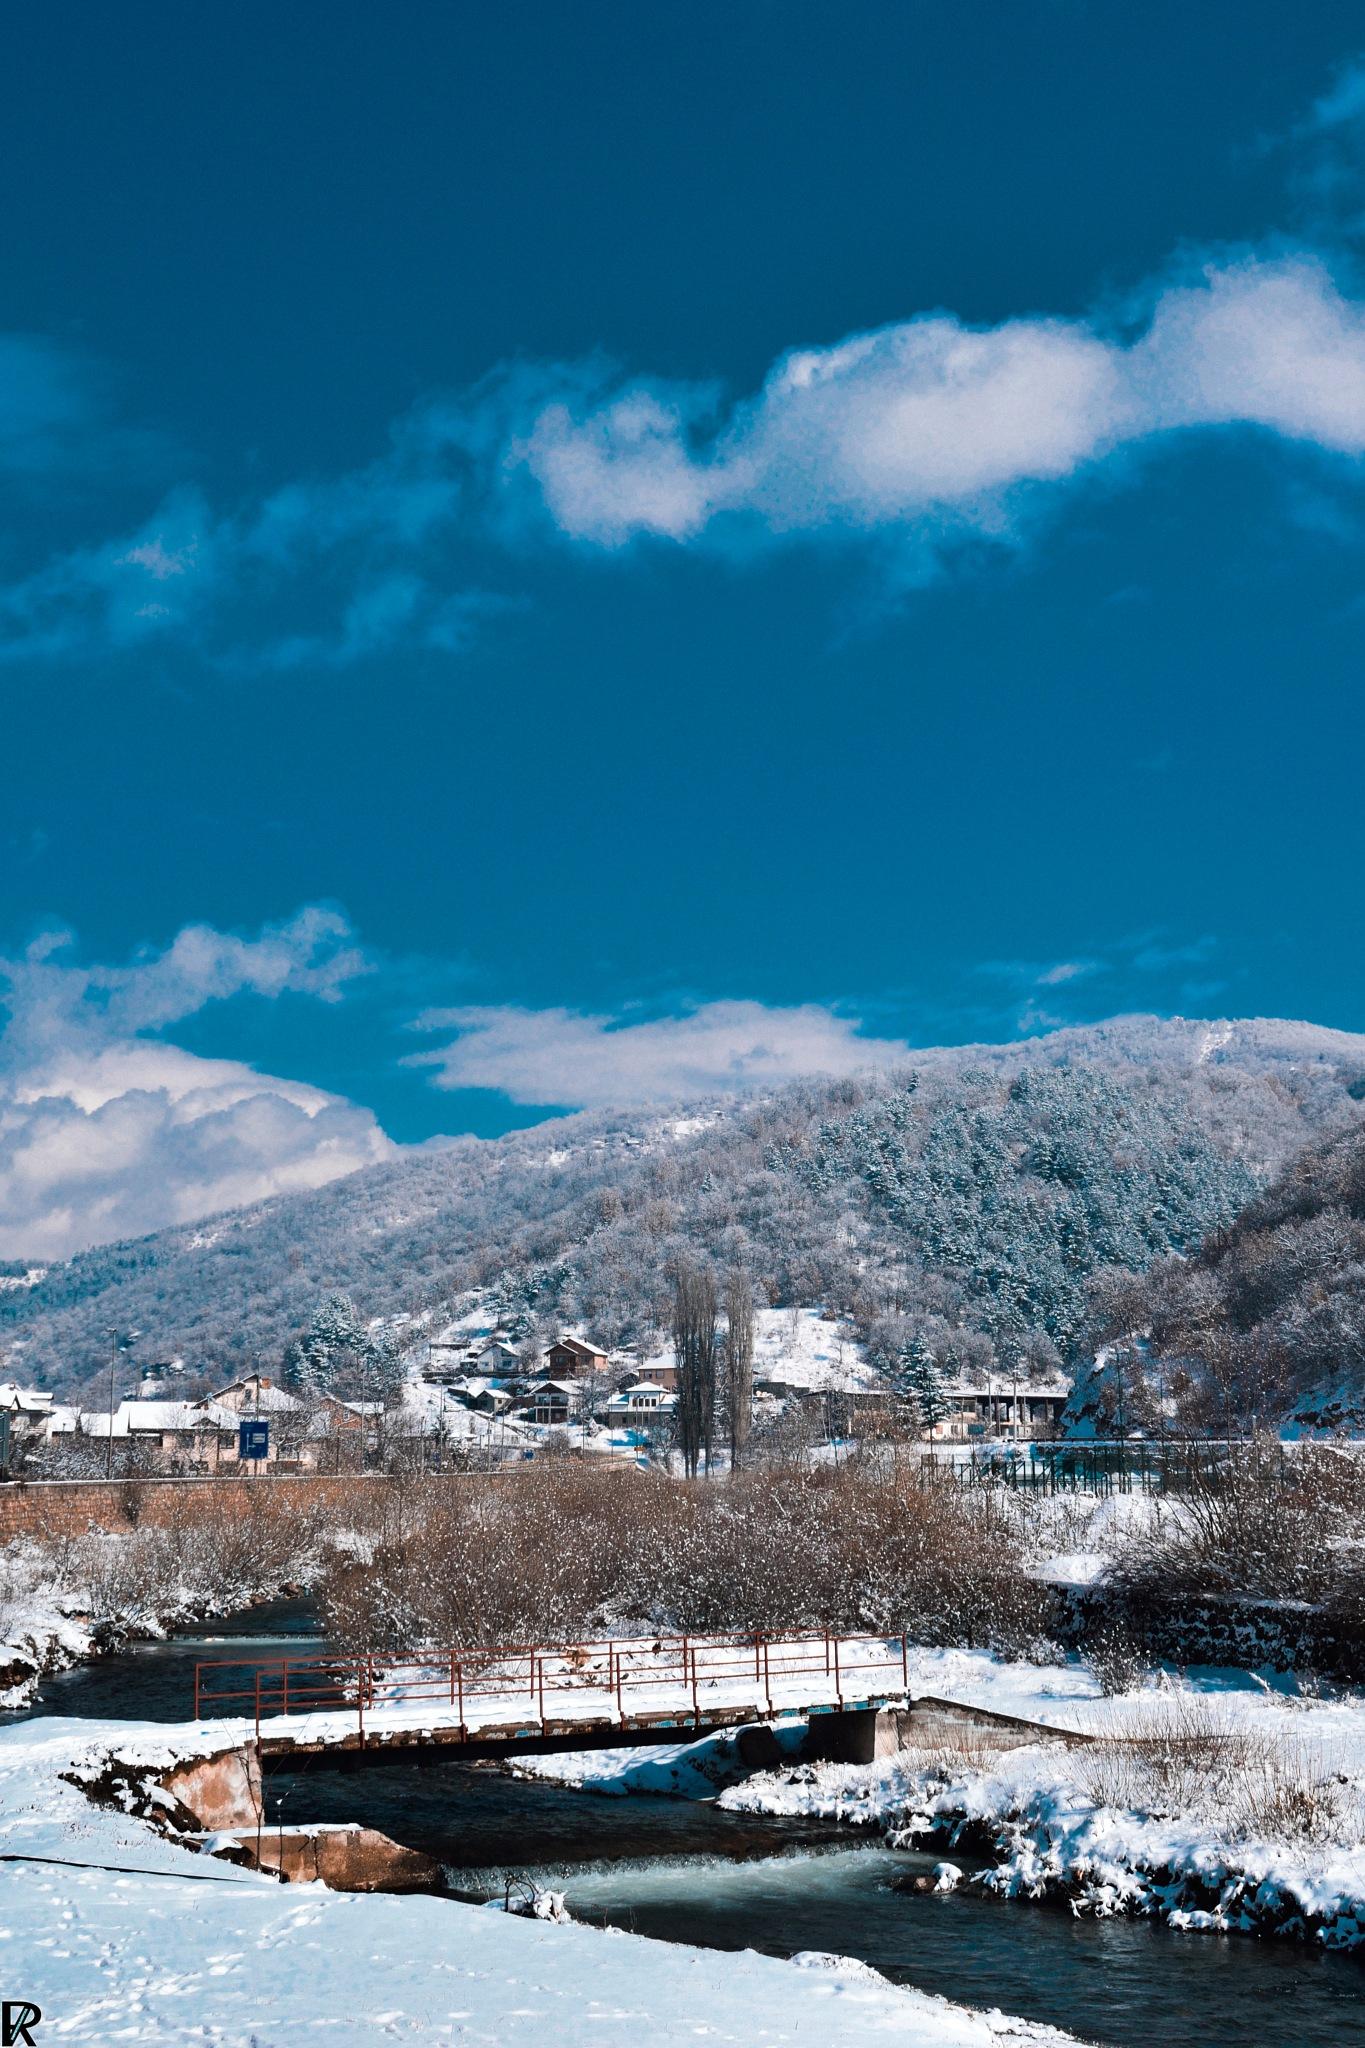 Winter in Kriva Palanka, Macedonia (13) by Robert Krstevski